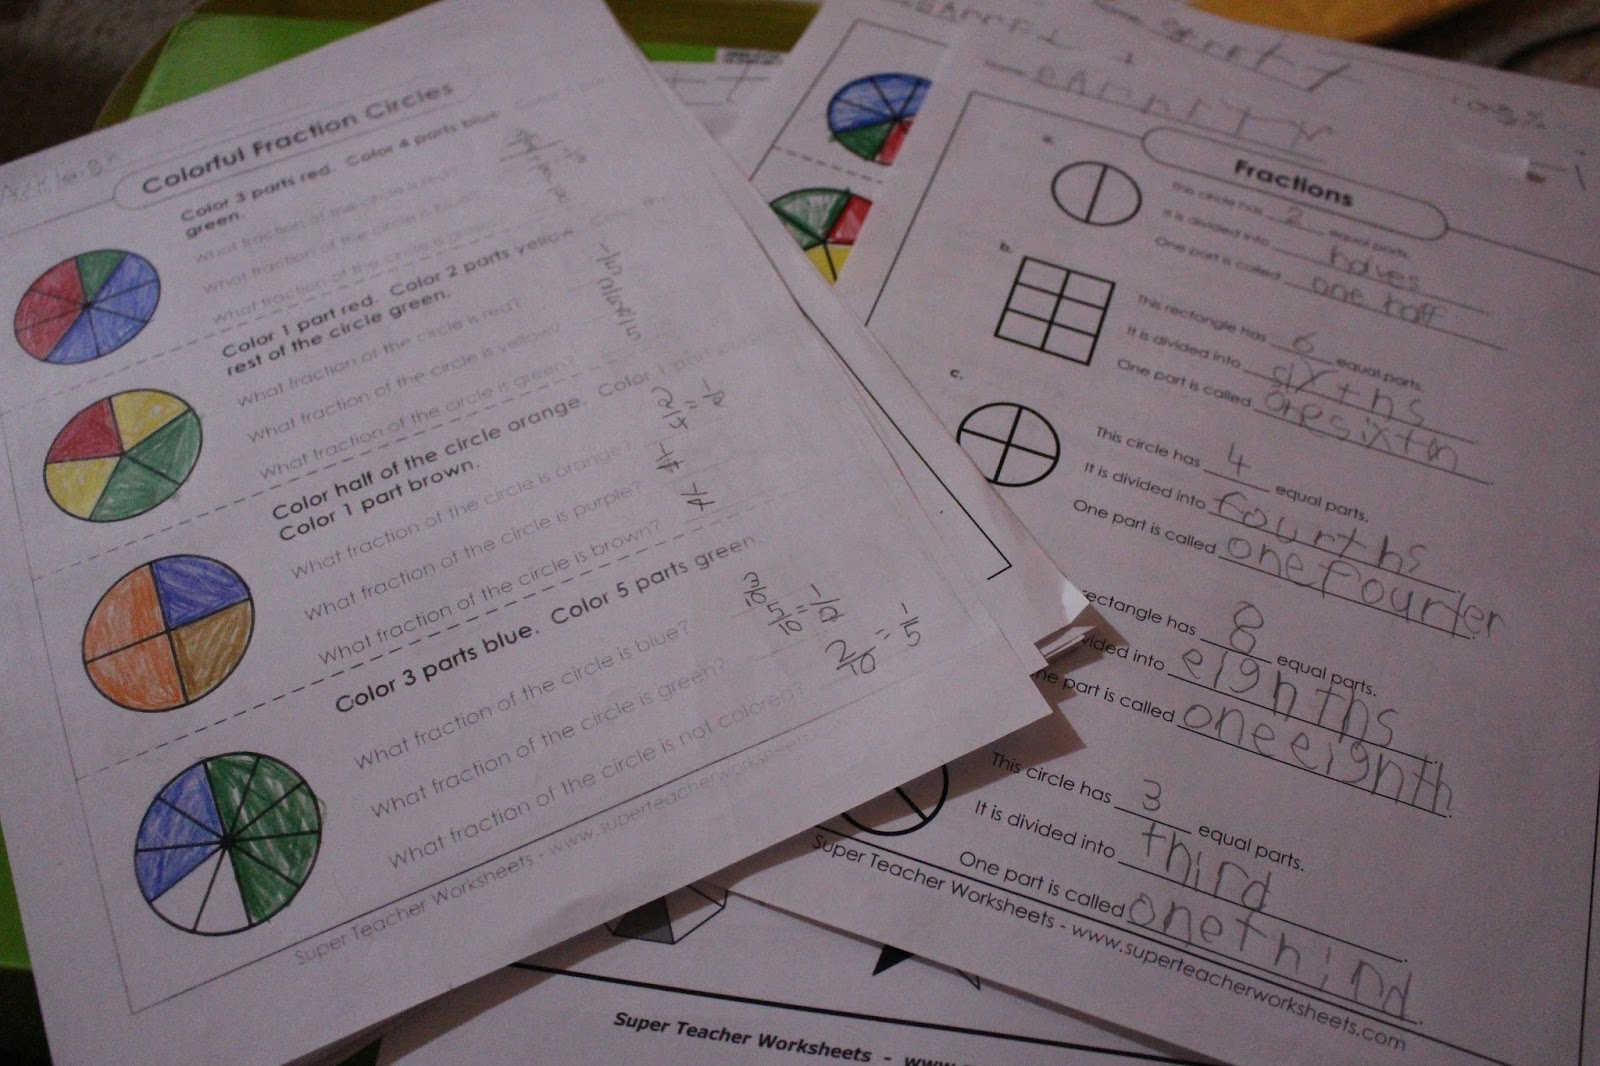 Counting Pinecones Super Teacher Worksheets A Homeschool